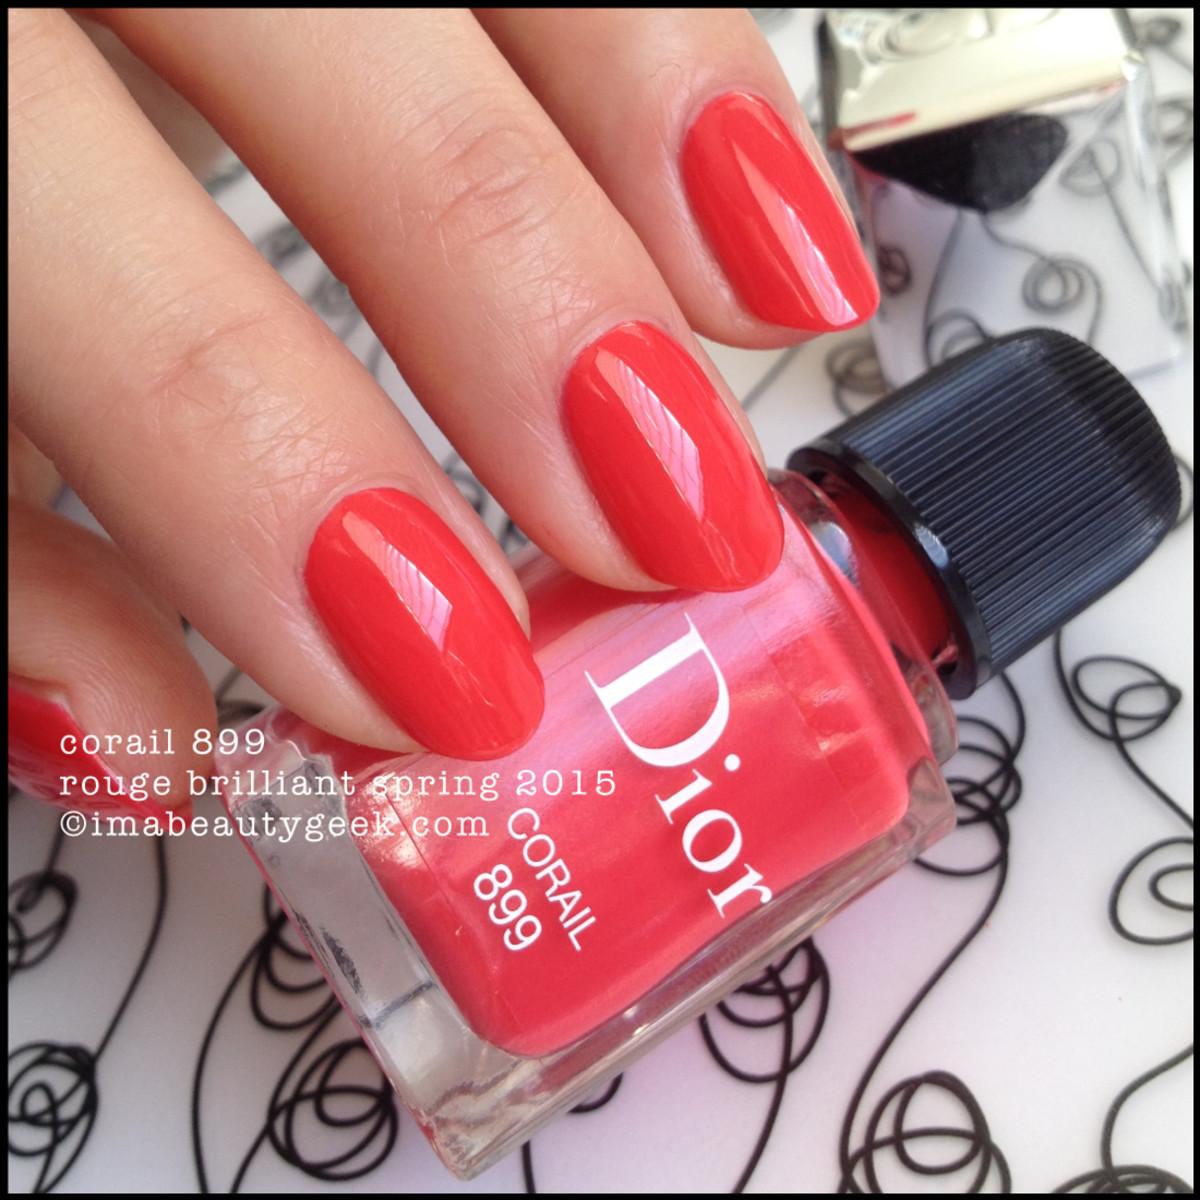 Dior Rouge Brilliant Spring 2015_Dior Corail 899 Vernis